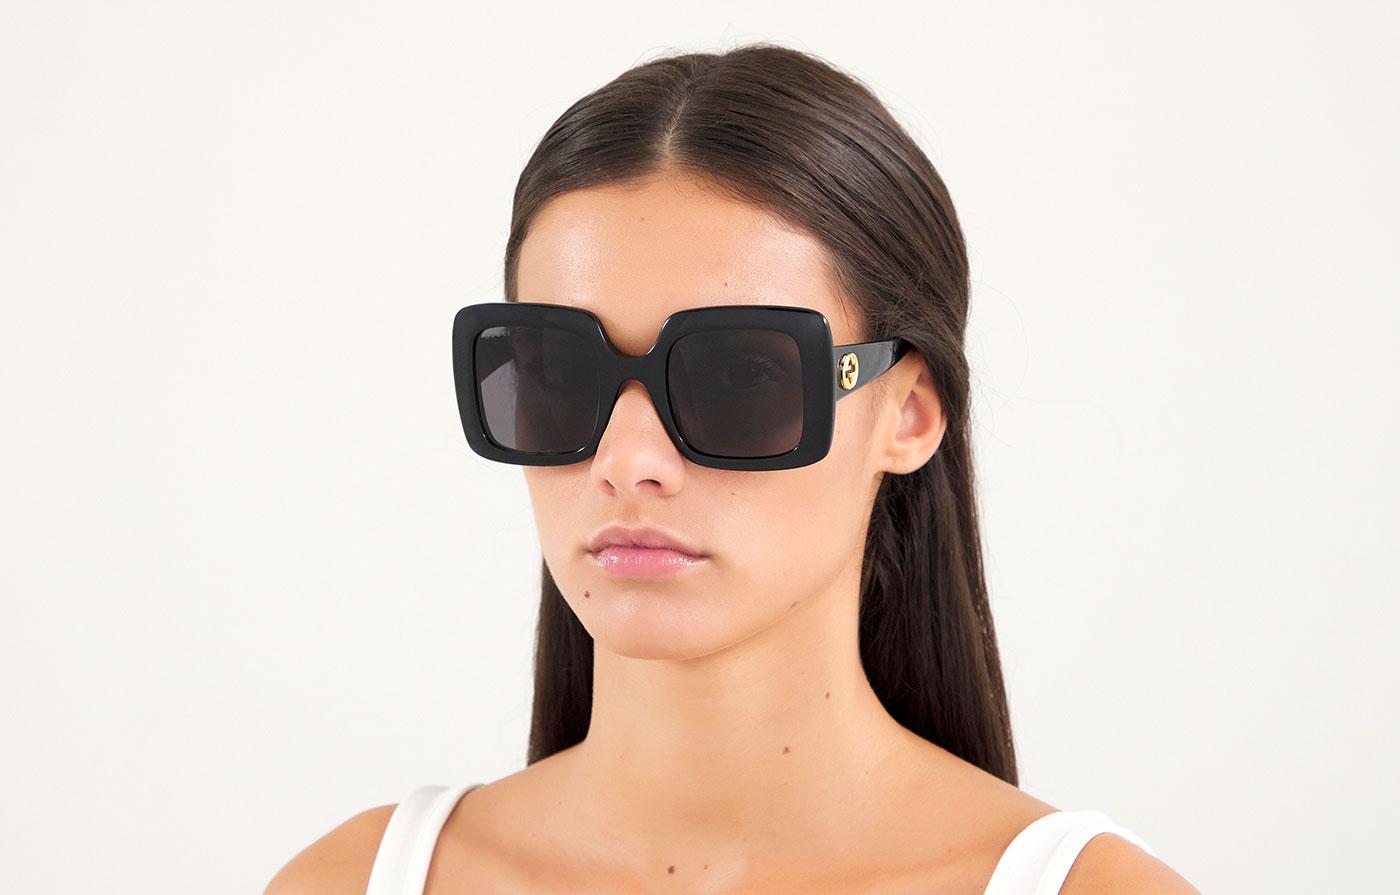 Gucci GG0896S Sunglasses - Black / Grey - Tortoise+Black